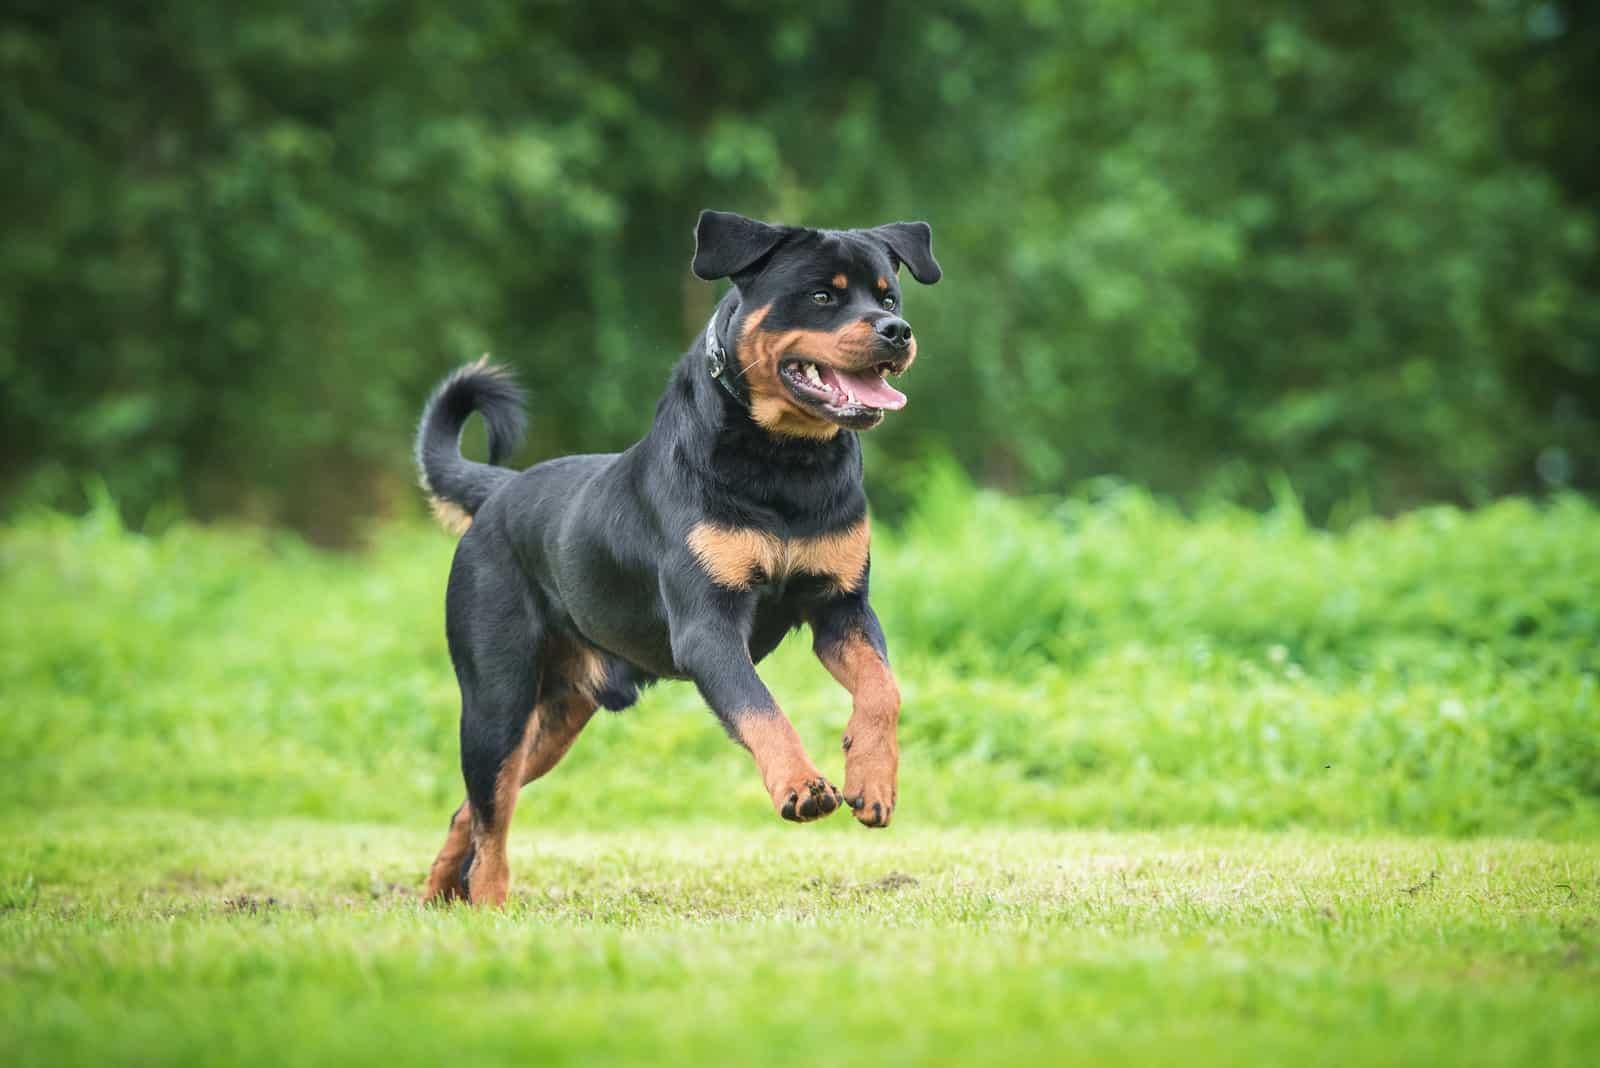 Happy rottweiler dog running in the yard